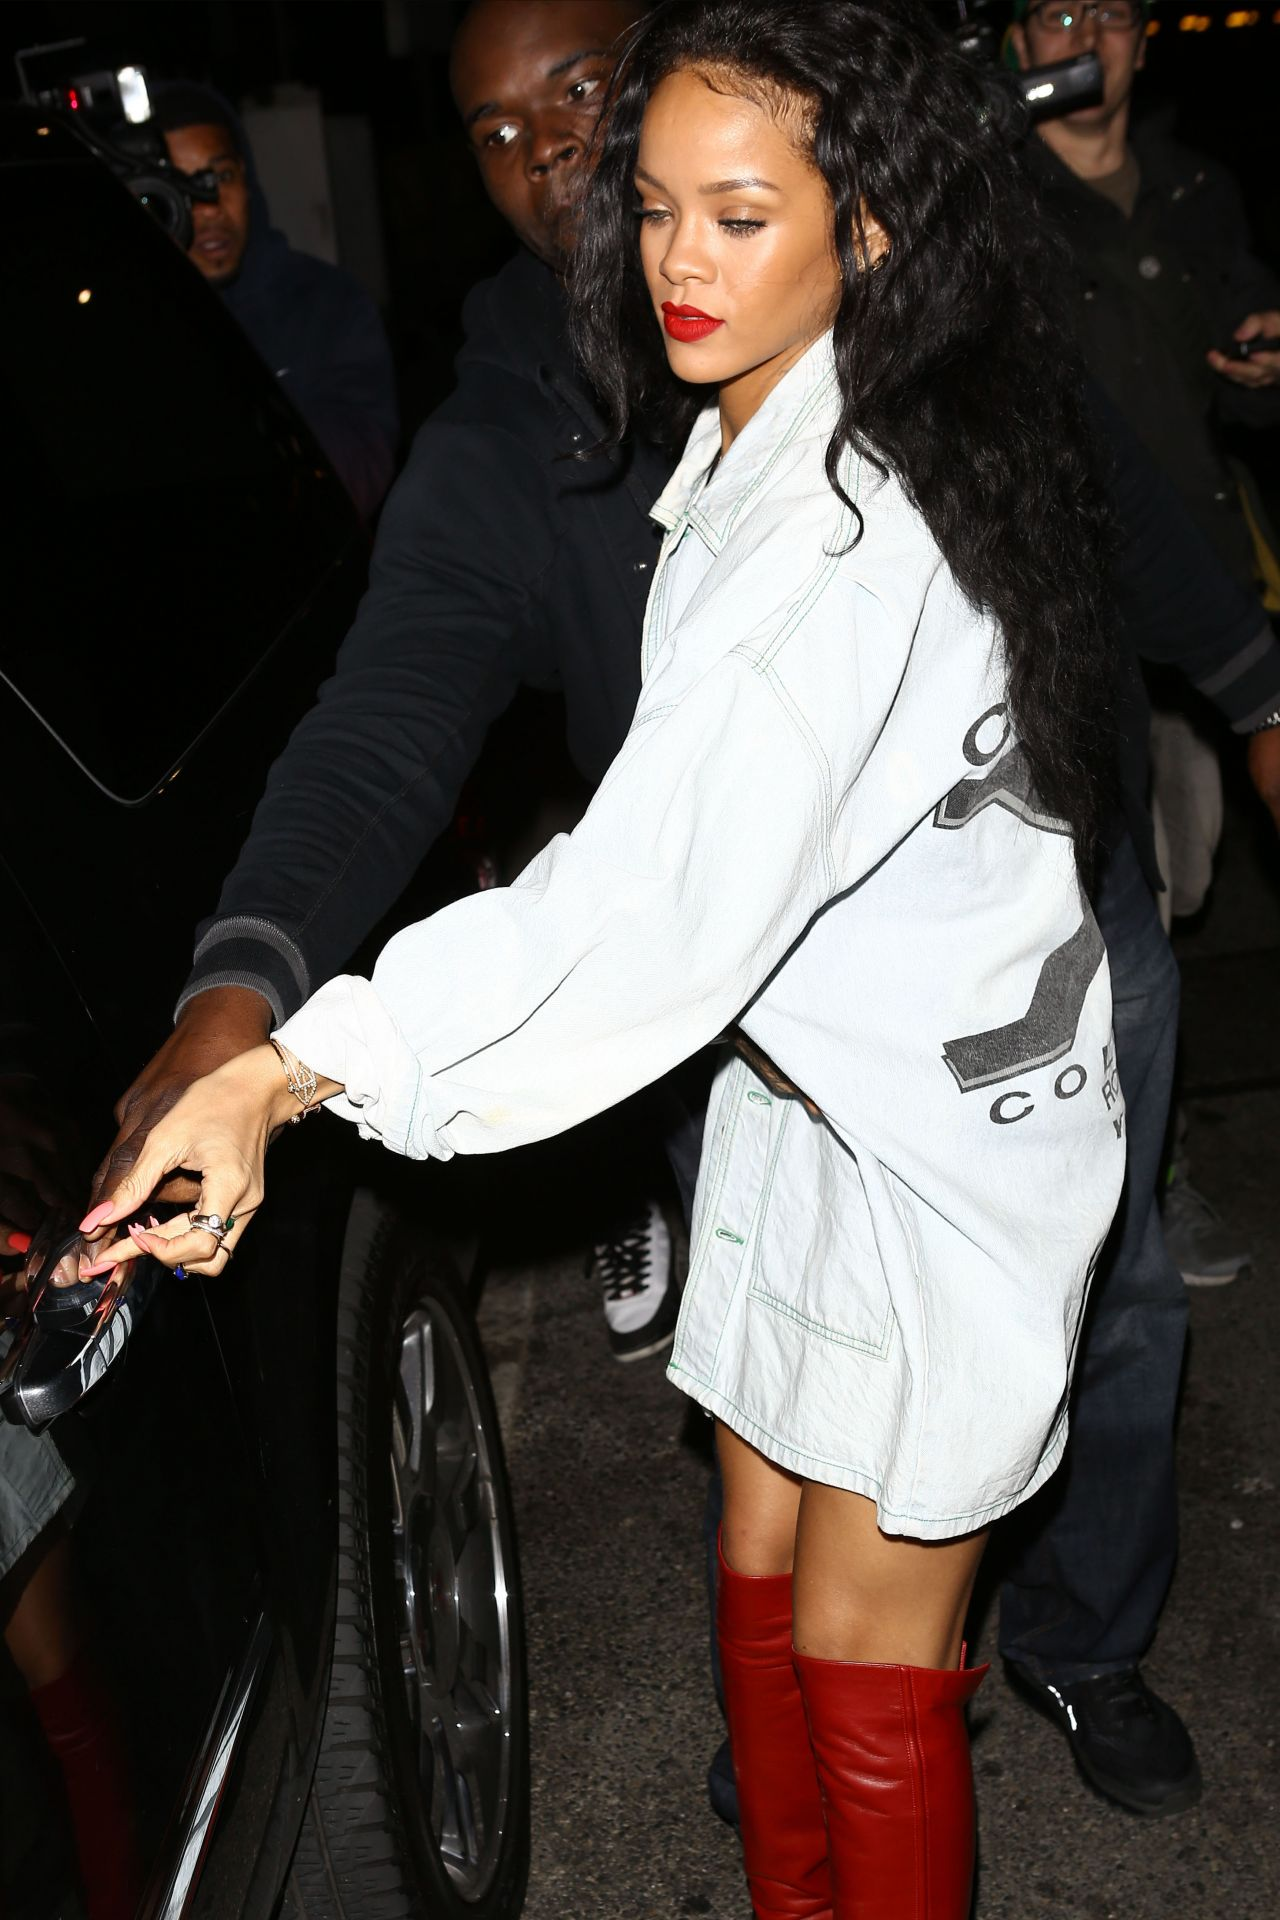 de03f5307ee Rihanna Night Out Style - Arrives at Giorgio Baldi Restaurant in Santa  Monica - April 2014